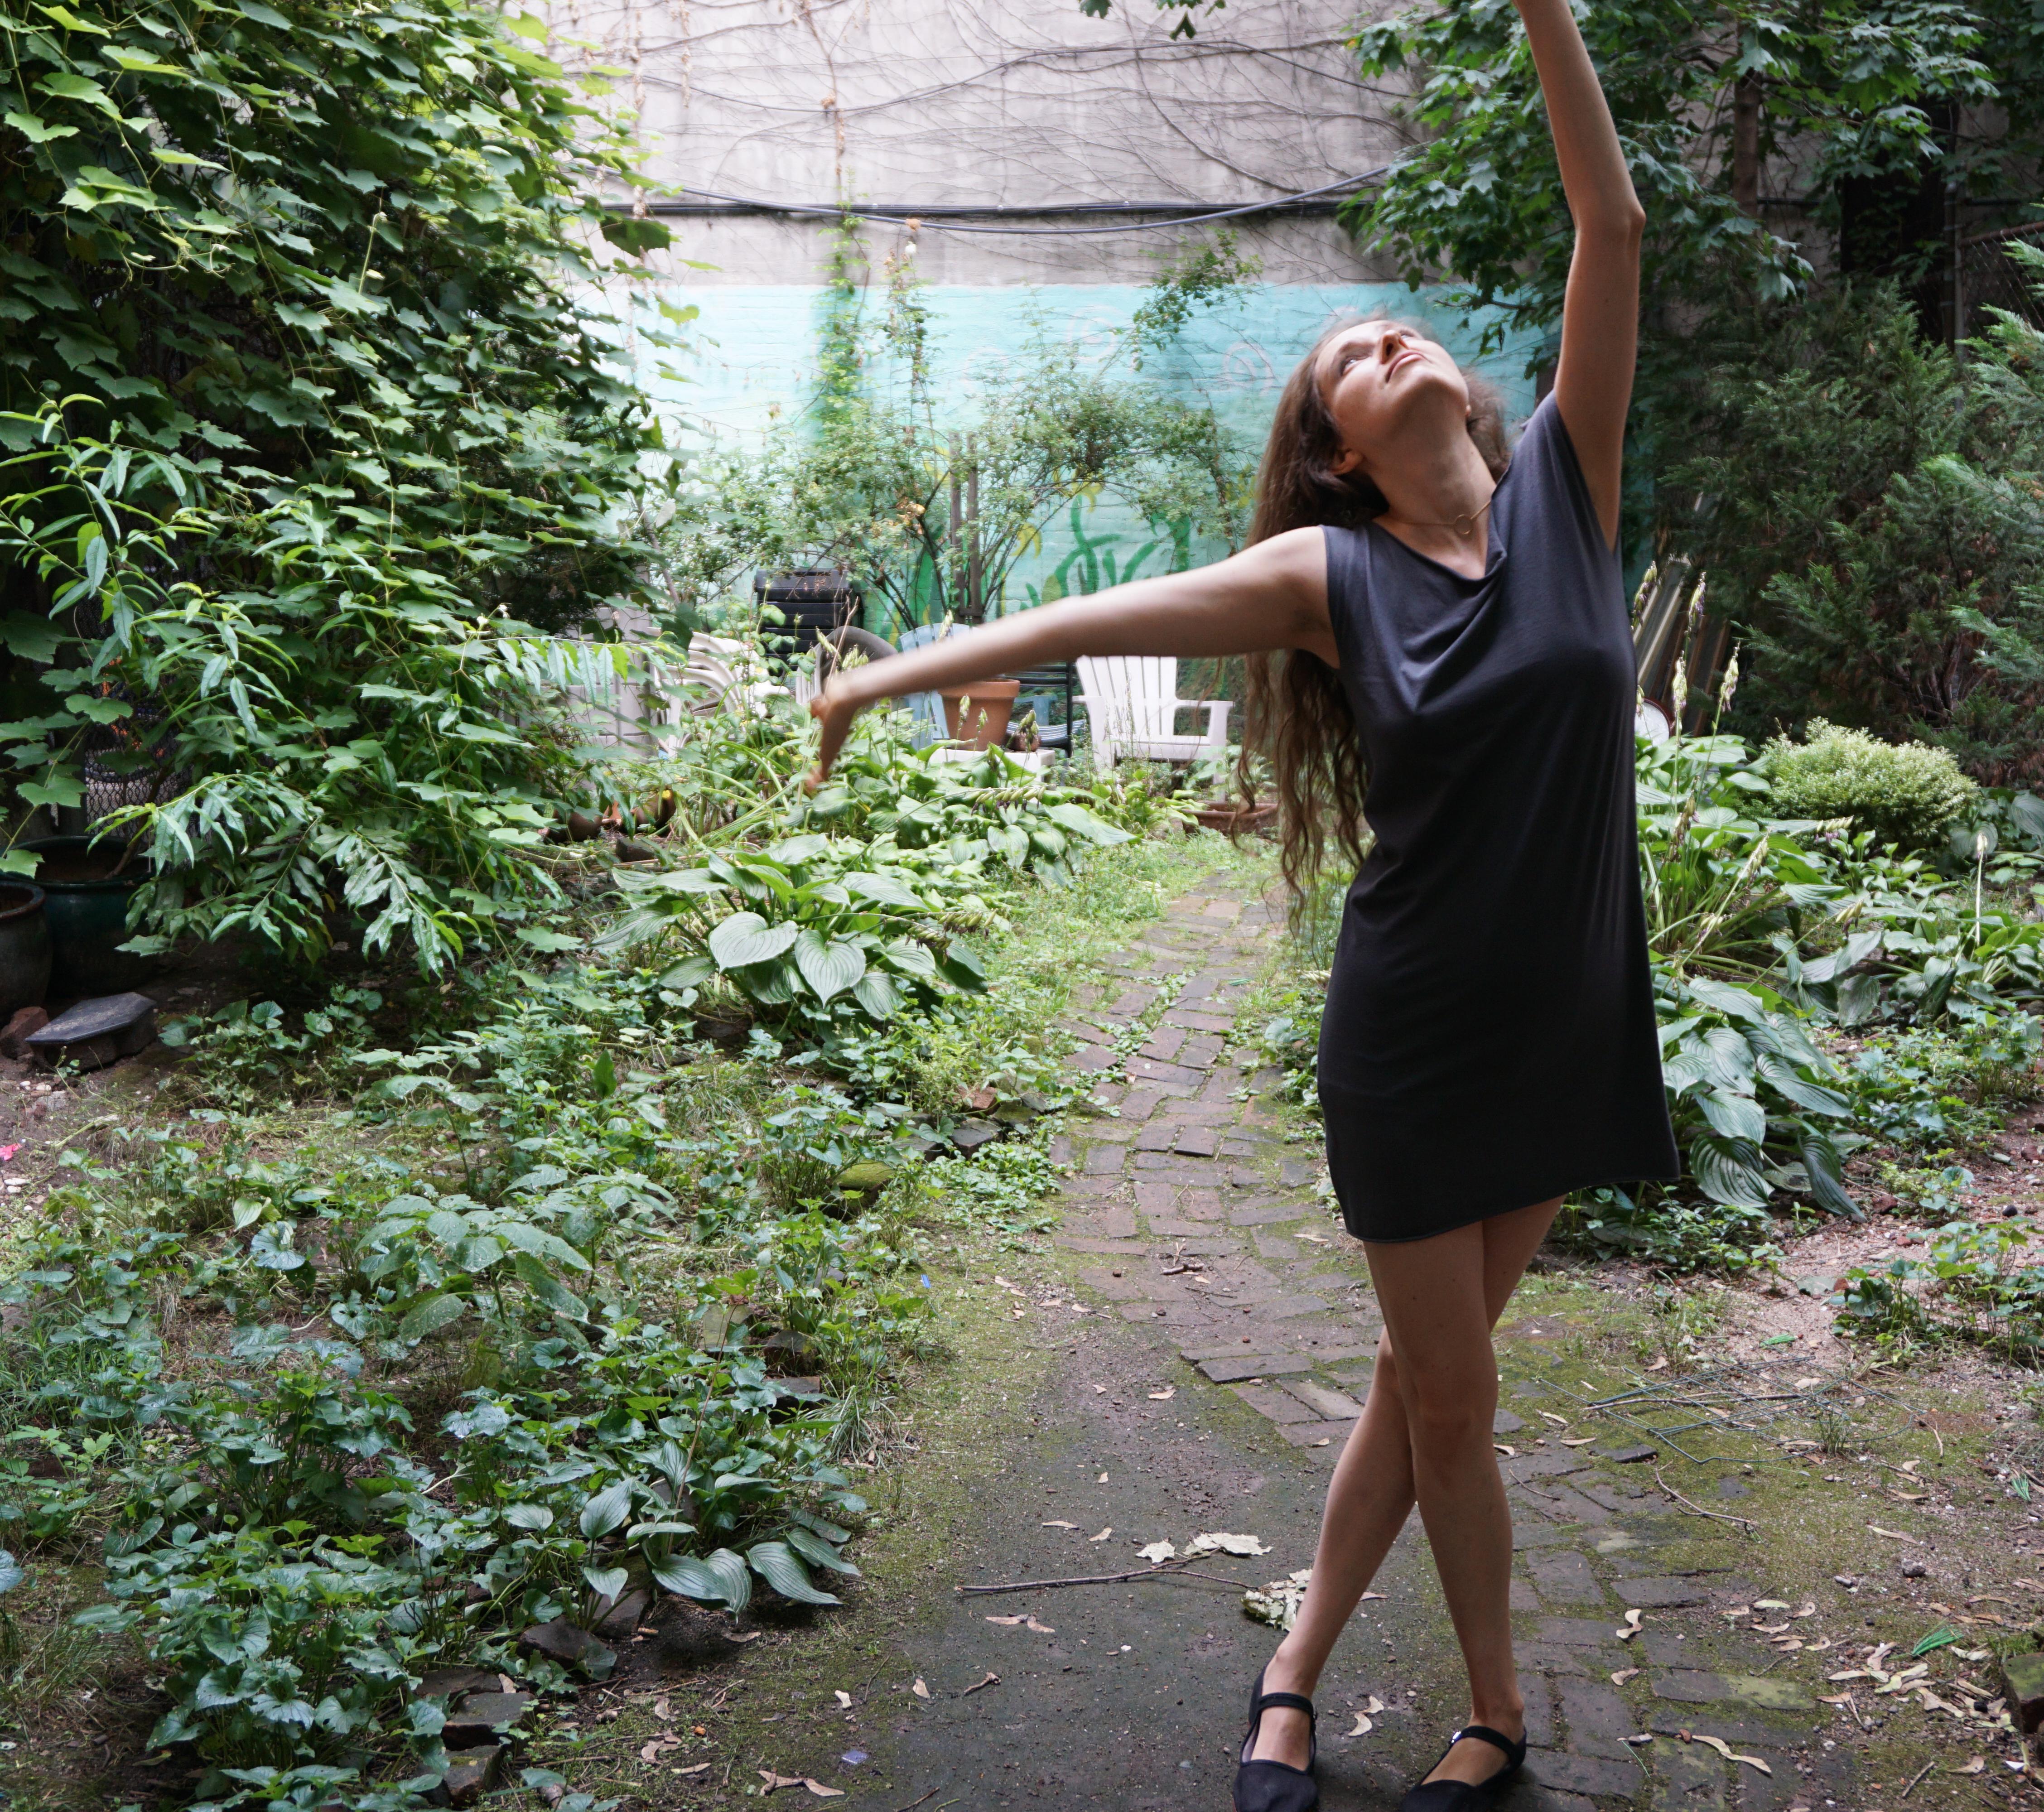 stadt natur community garden nyc east village